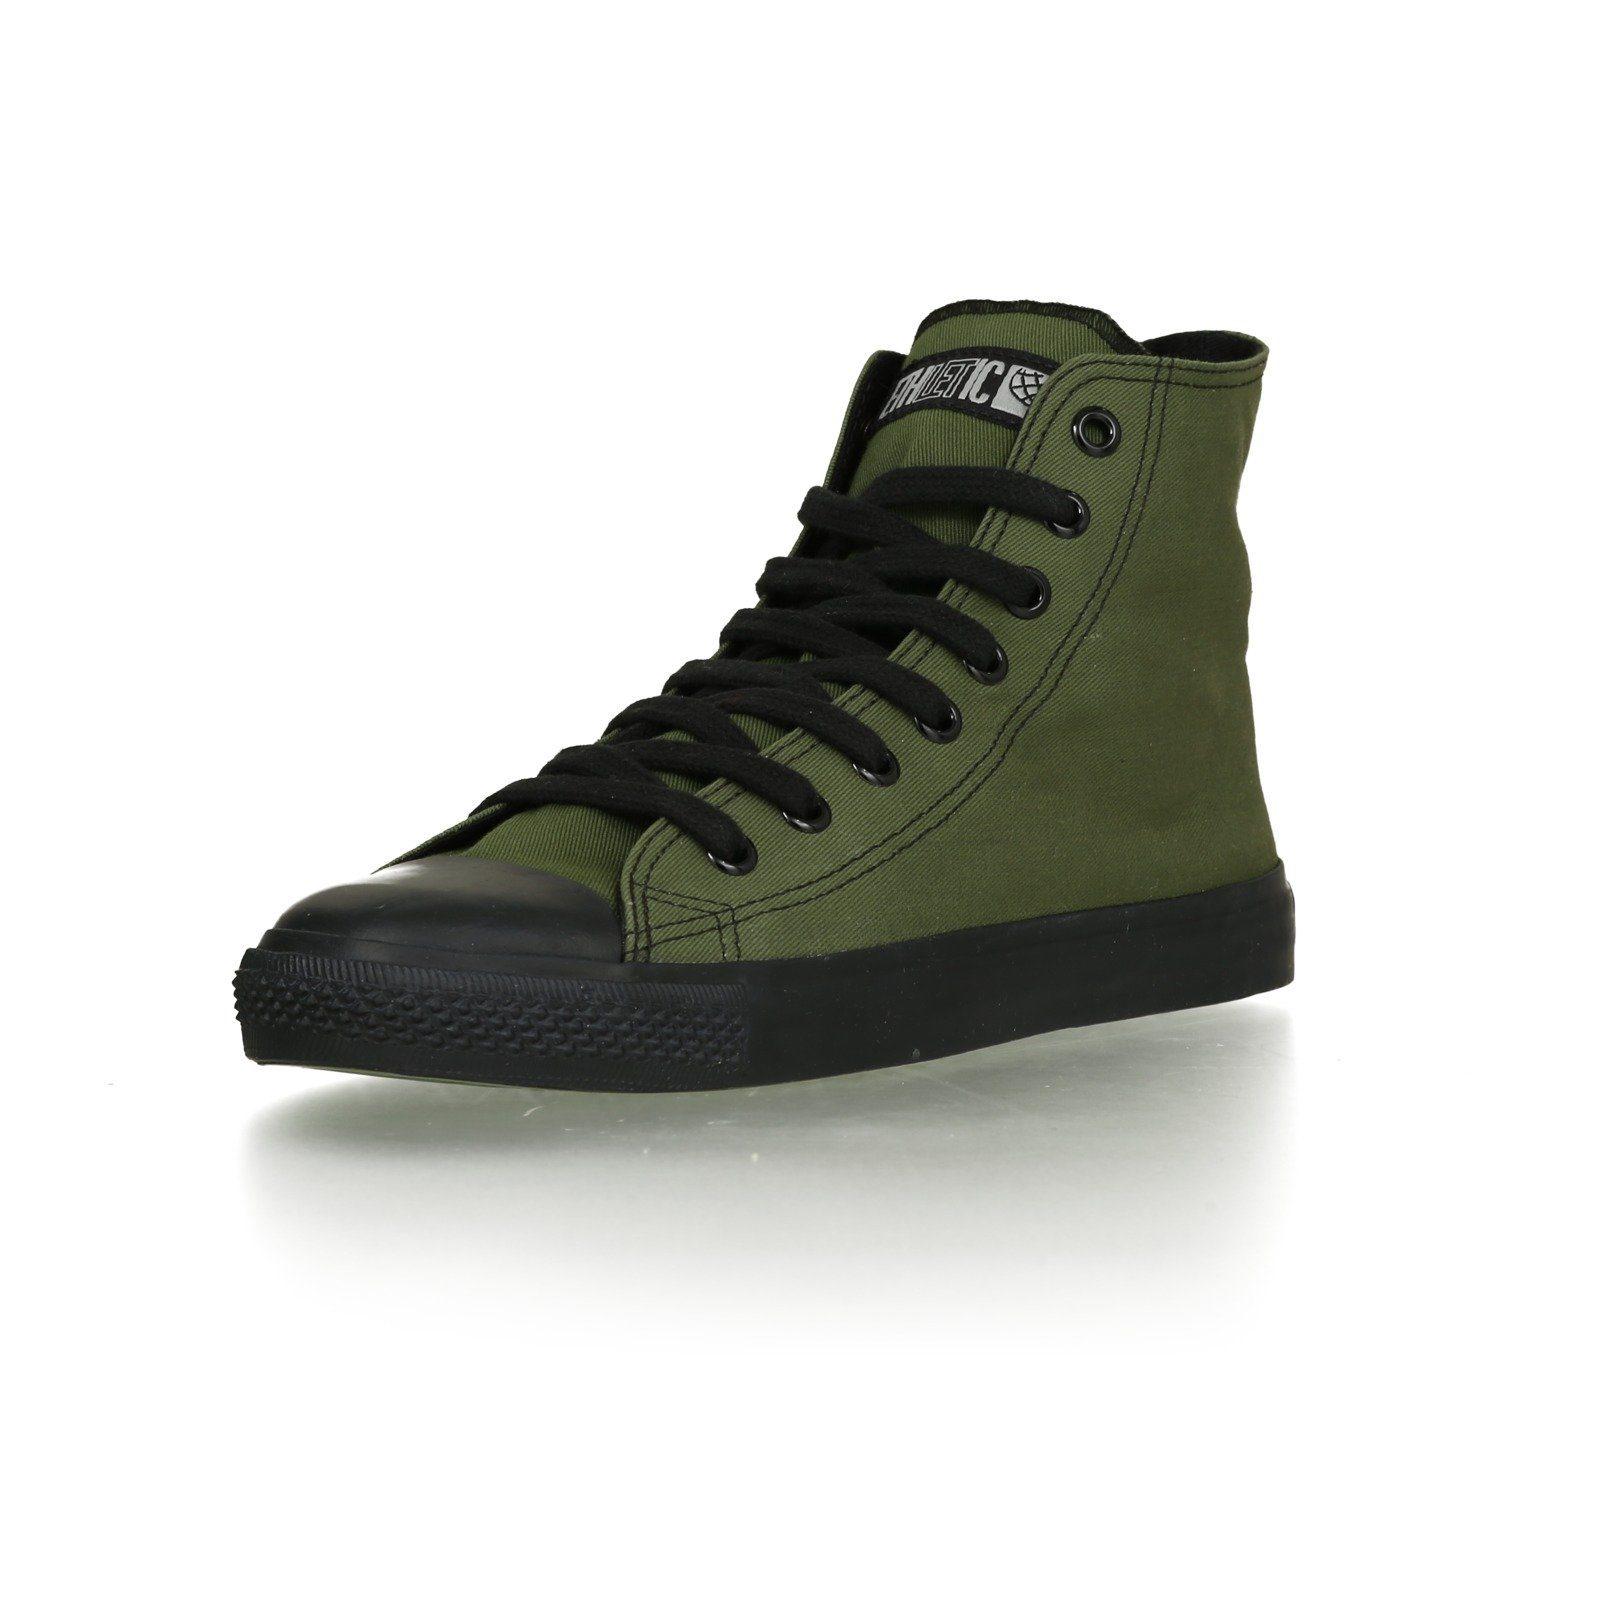 ETHLETIC Sneaker aus nachhaltiger Produktion Black Cap Hi Cut Classic online kaufen  Camping Green | Jet Black